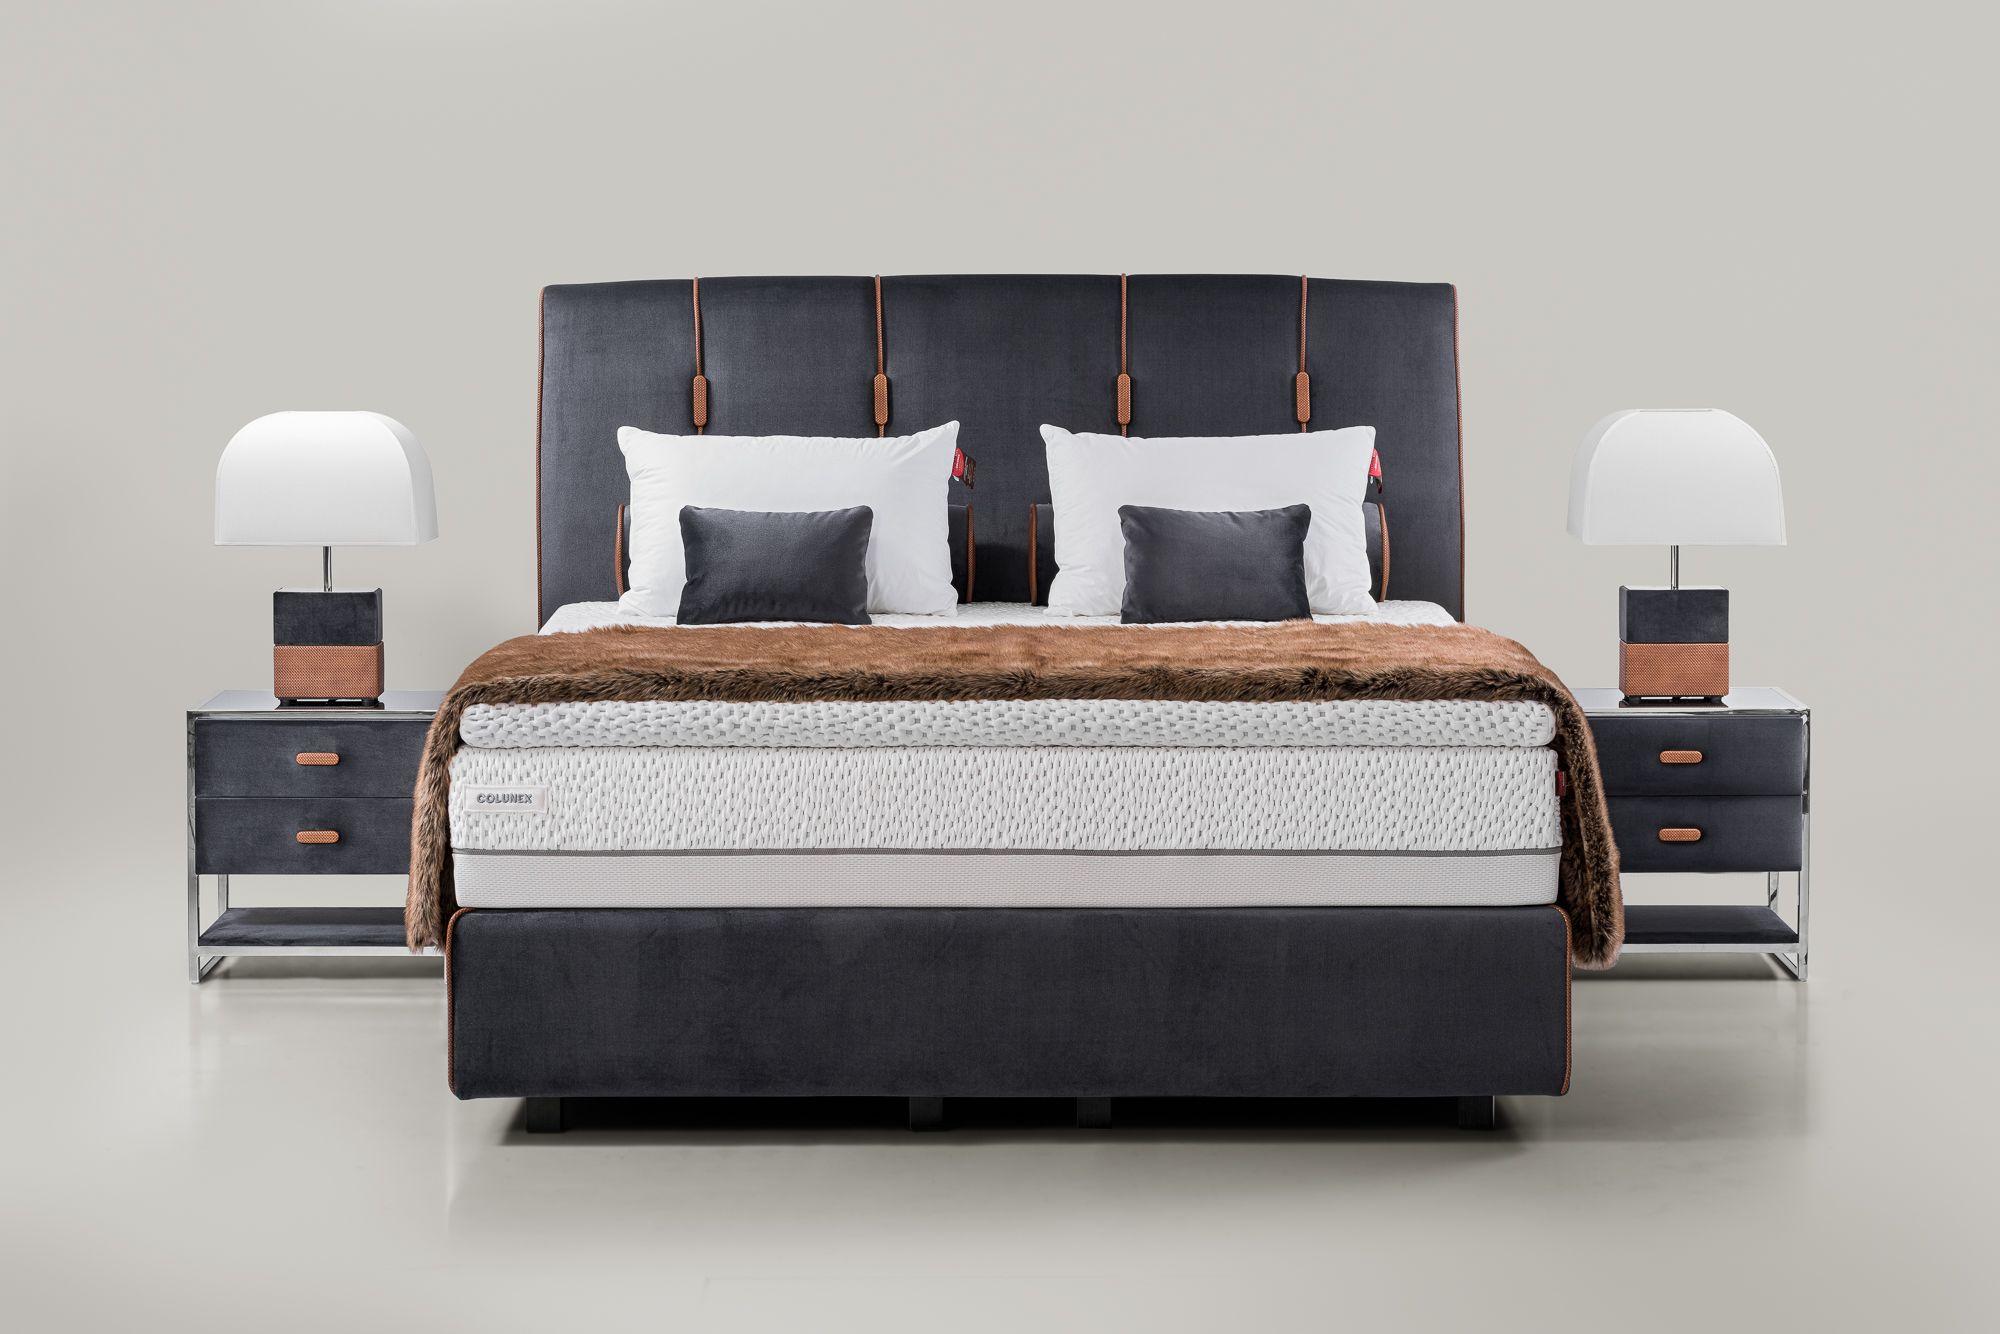 Benjamin Bed By Colunex Bedroom Bed Design Bed Furniture New